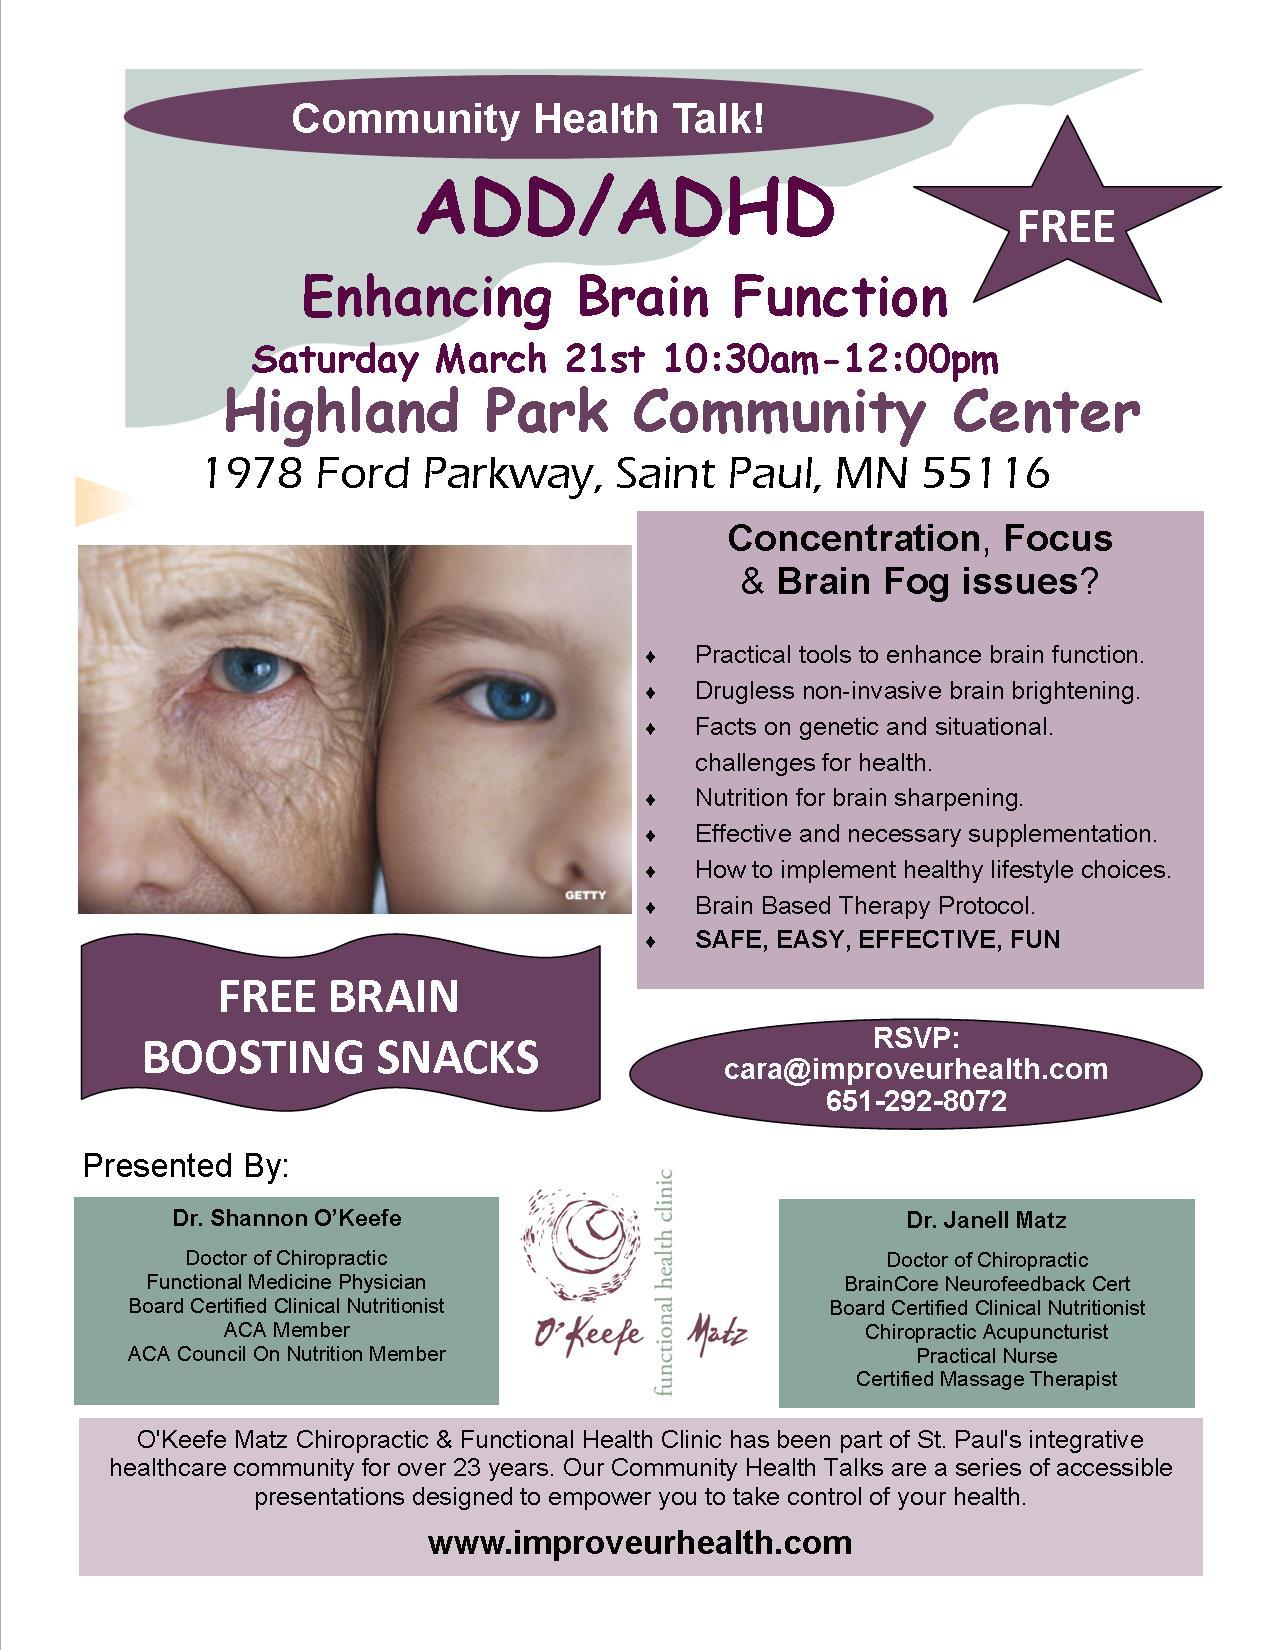 ADD/ADHD: Enhancing Brain Function | O'Keefe & Matz